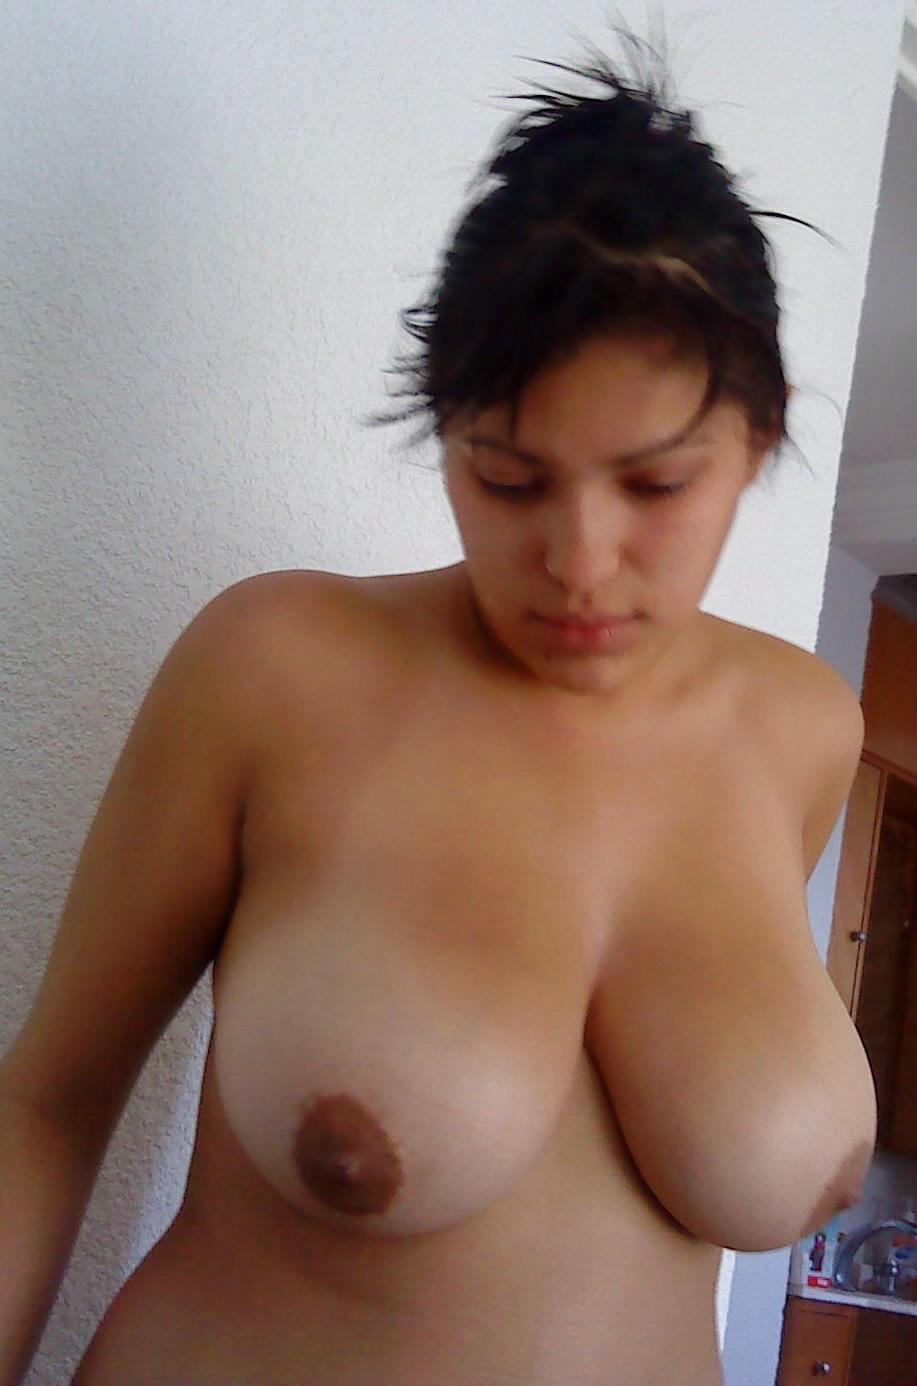 Short sex clip for mobile